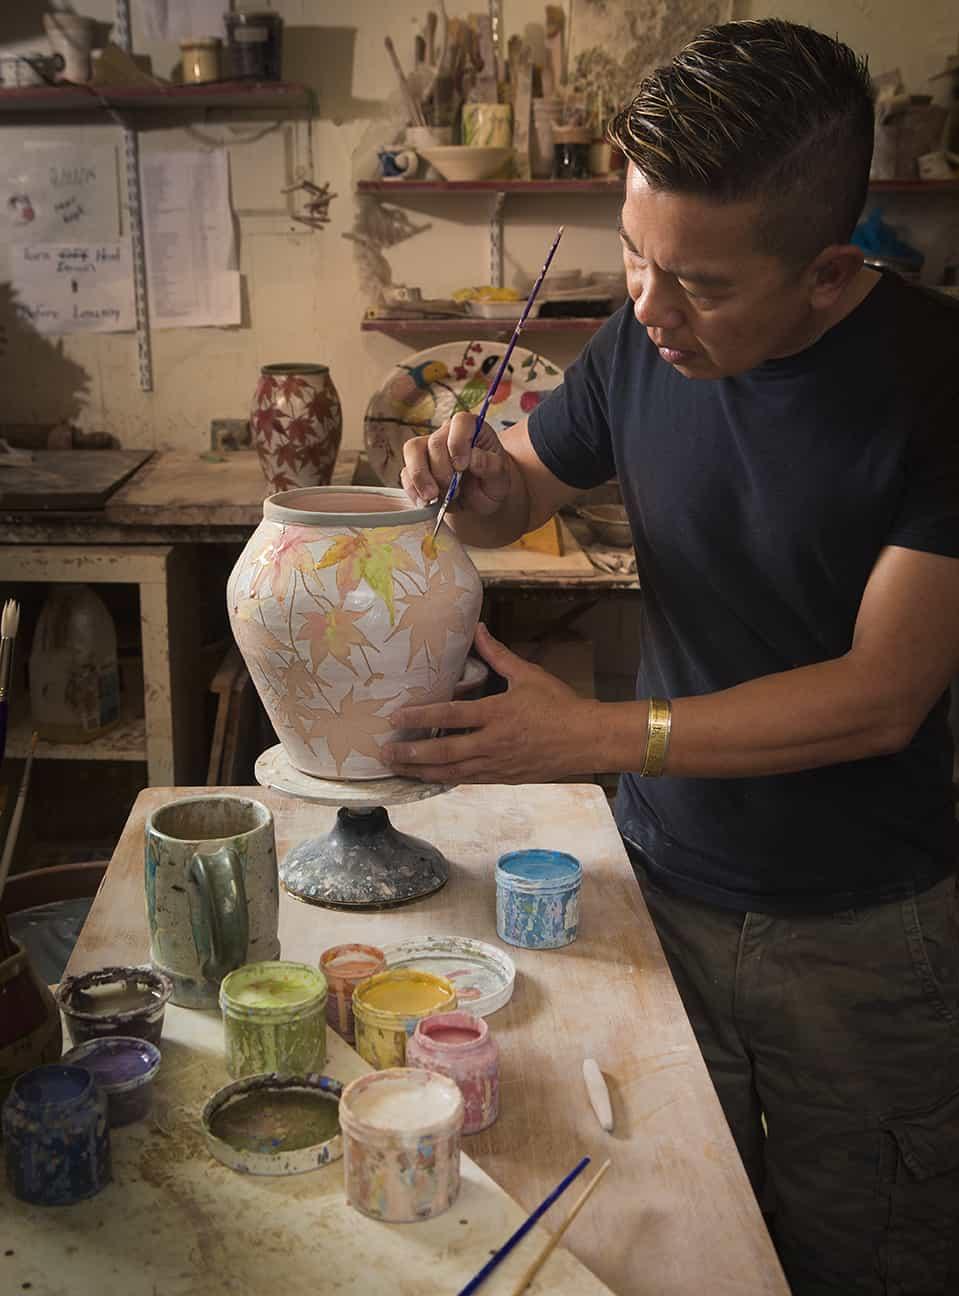 Dwo Wen Chen in his studio | All photos courtesy Three Wheel Studio website